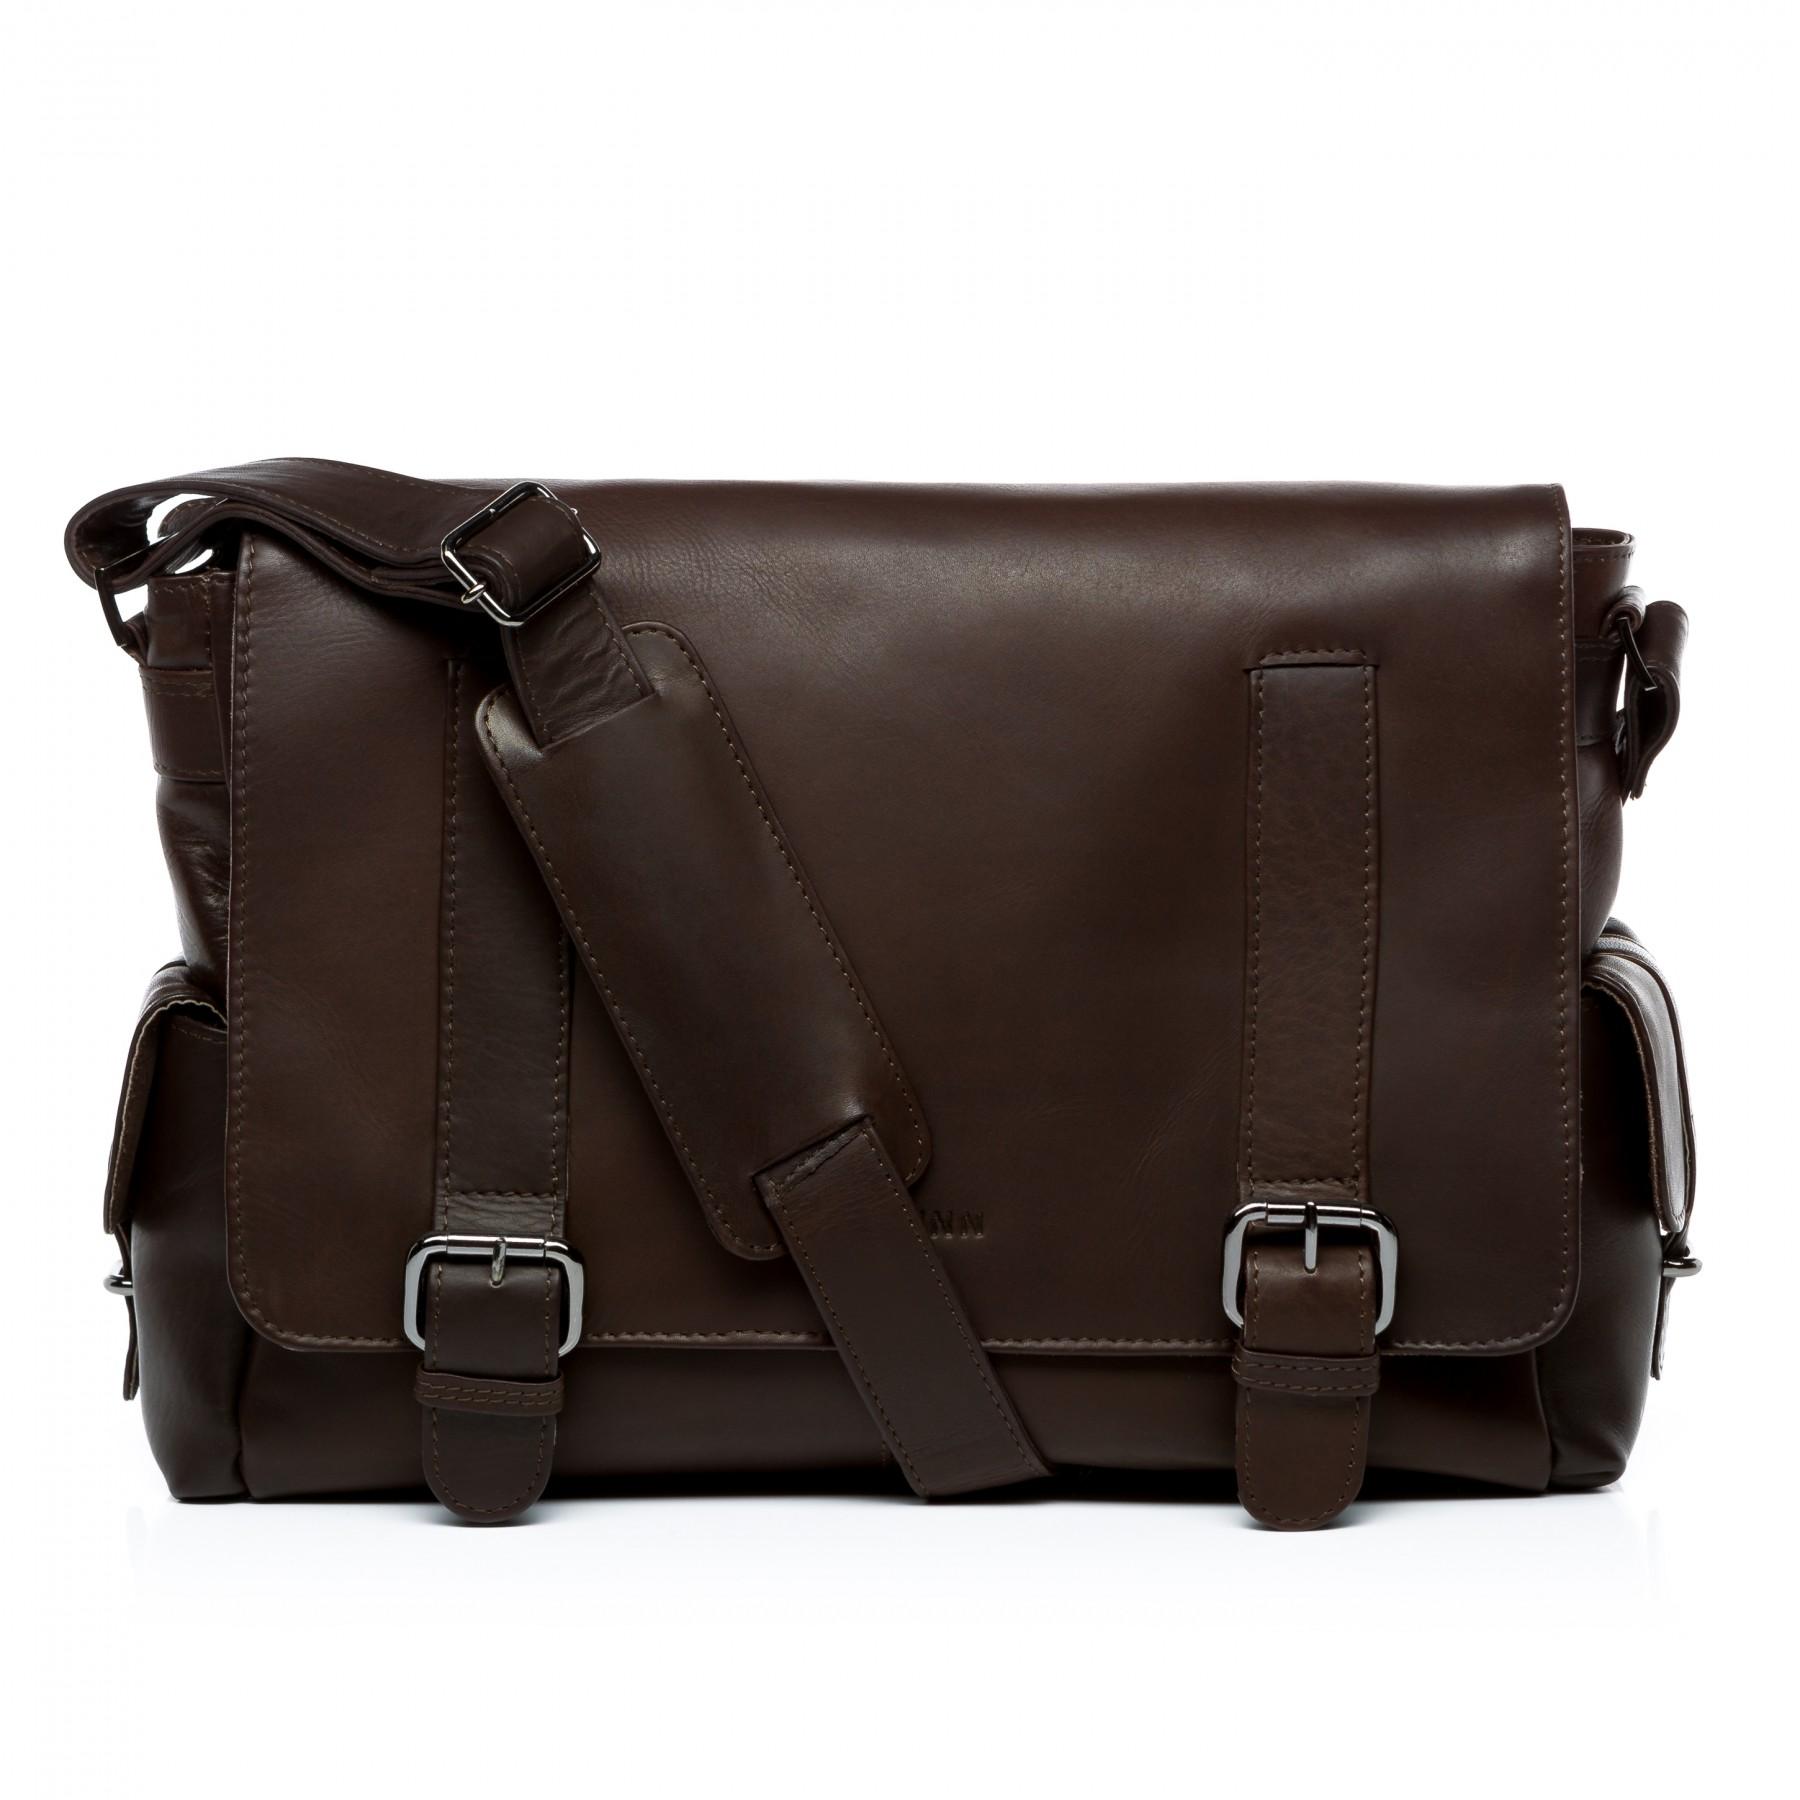 cca0cf0140465 Businesstaschen aus Leder entdecken - Guide